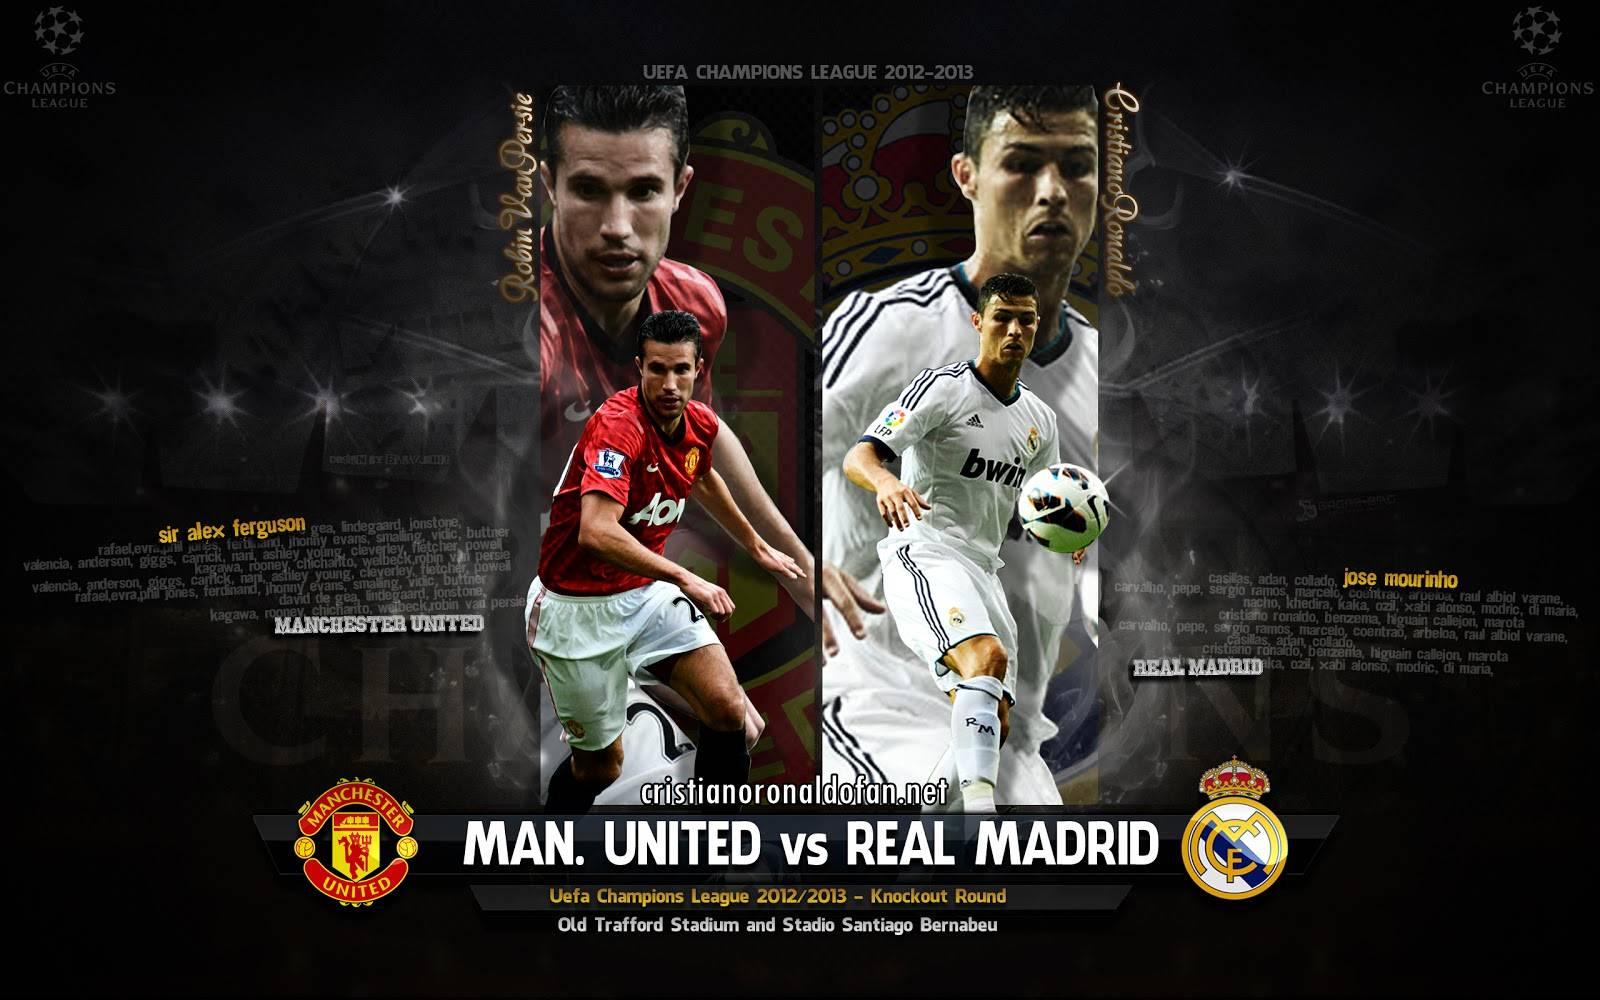 Wallpaper Manchester United Vs Real Madrid Cristiano Ronaldo